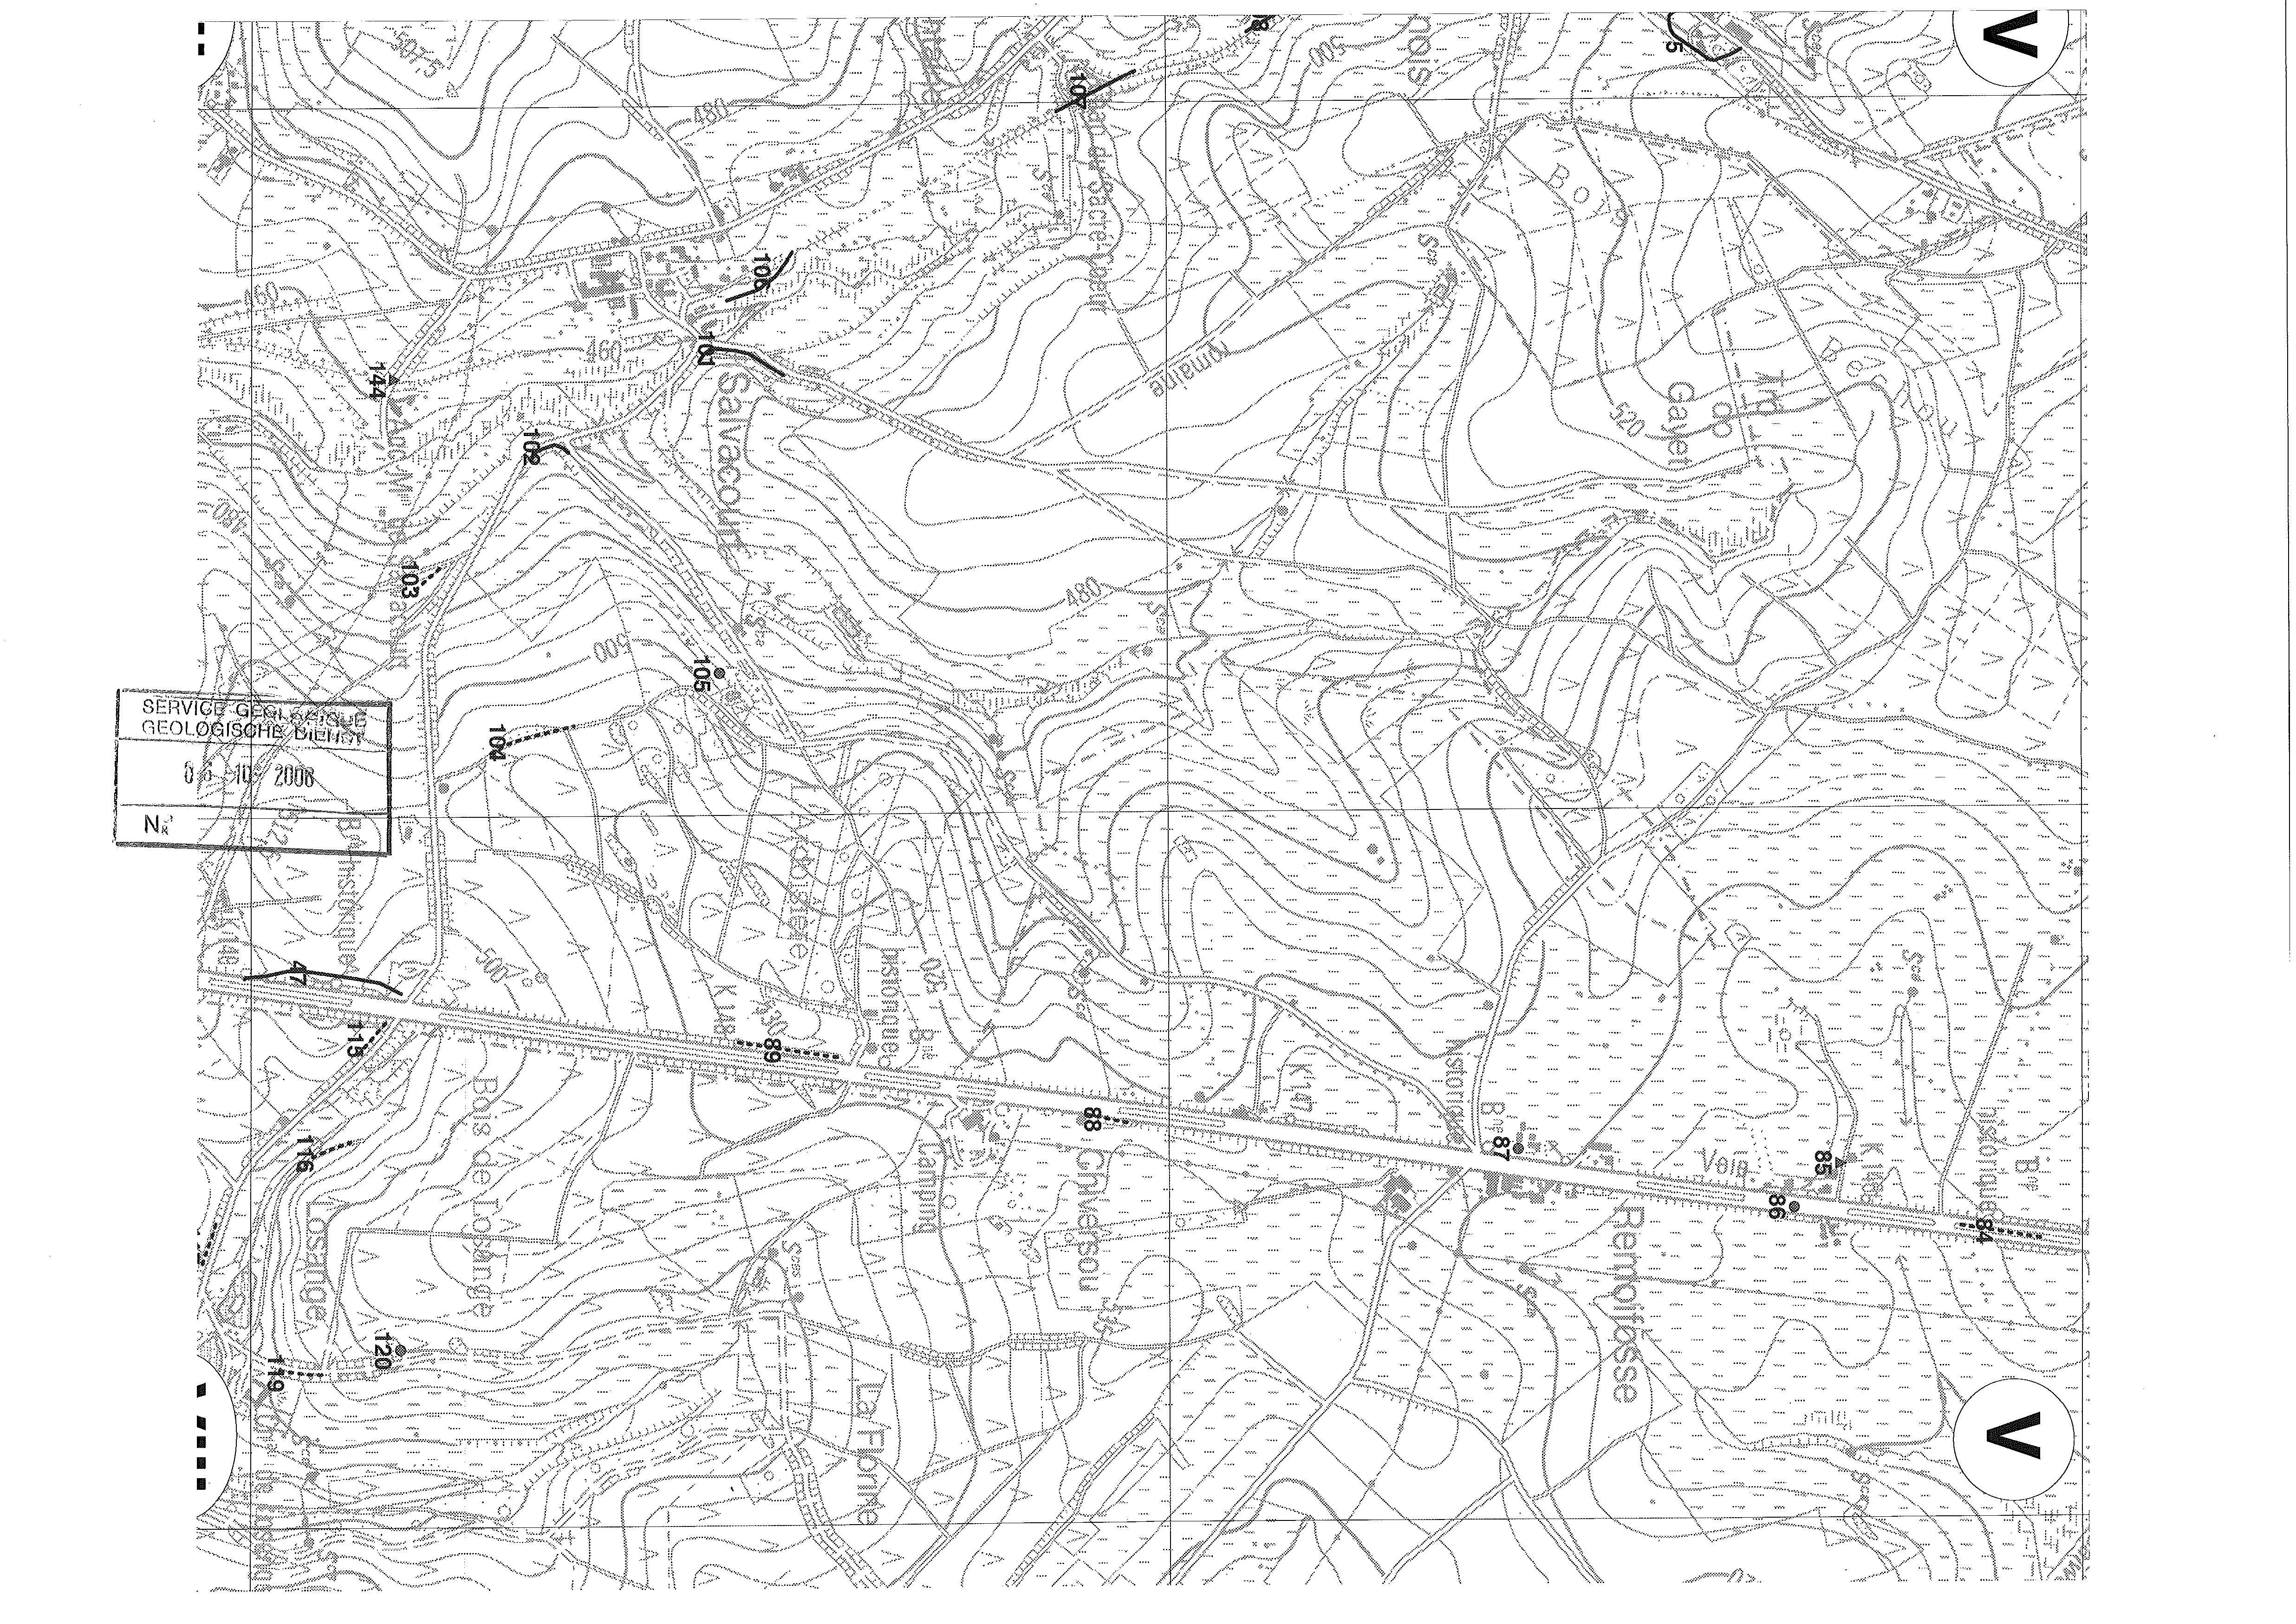 205W_Bastogne_Page_5_Image_0001.jpg